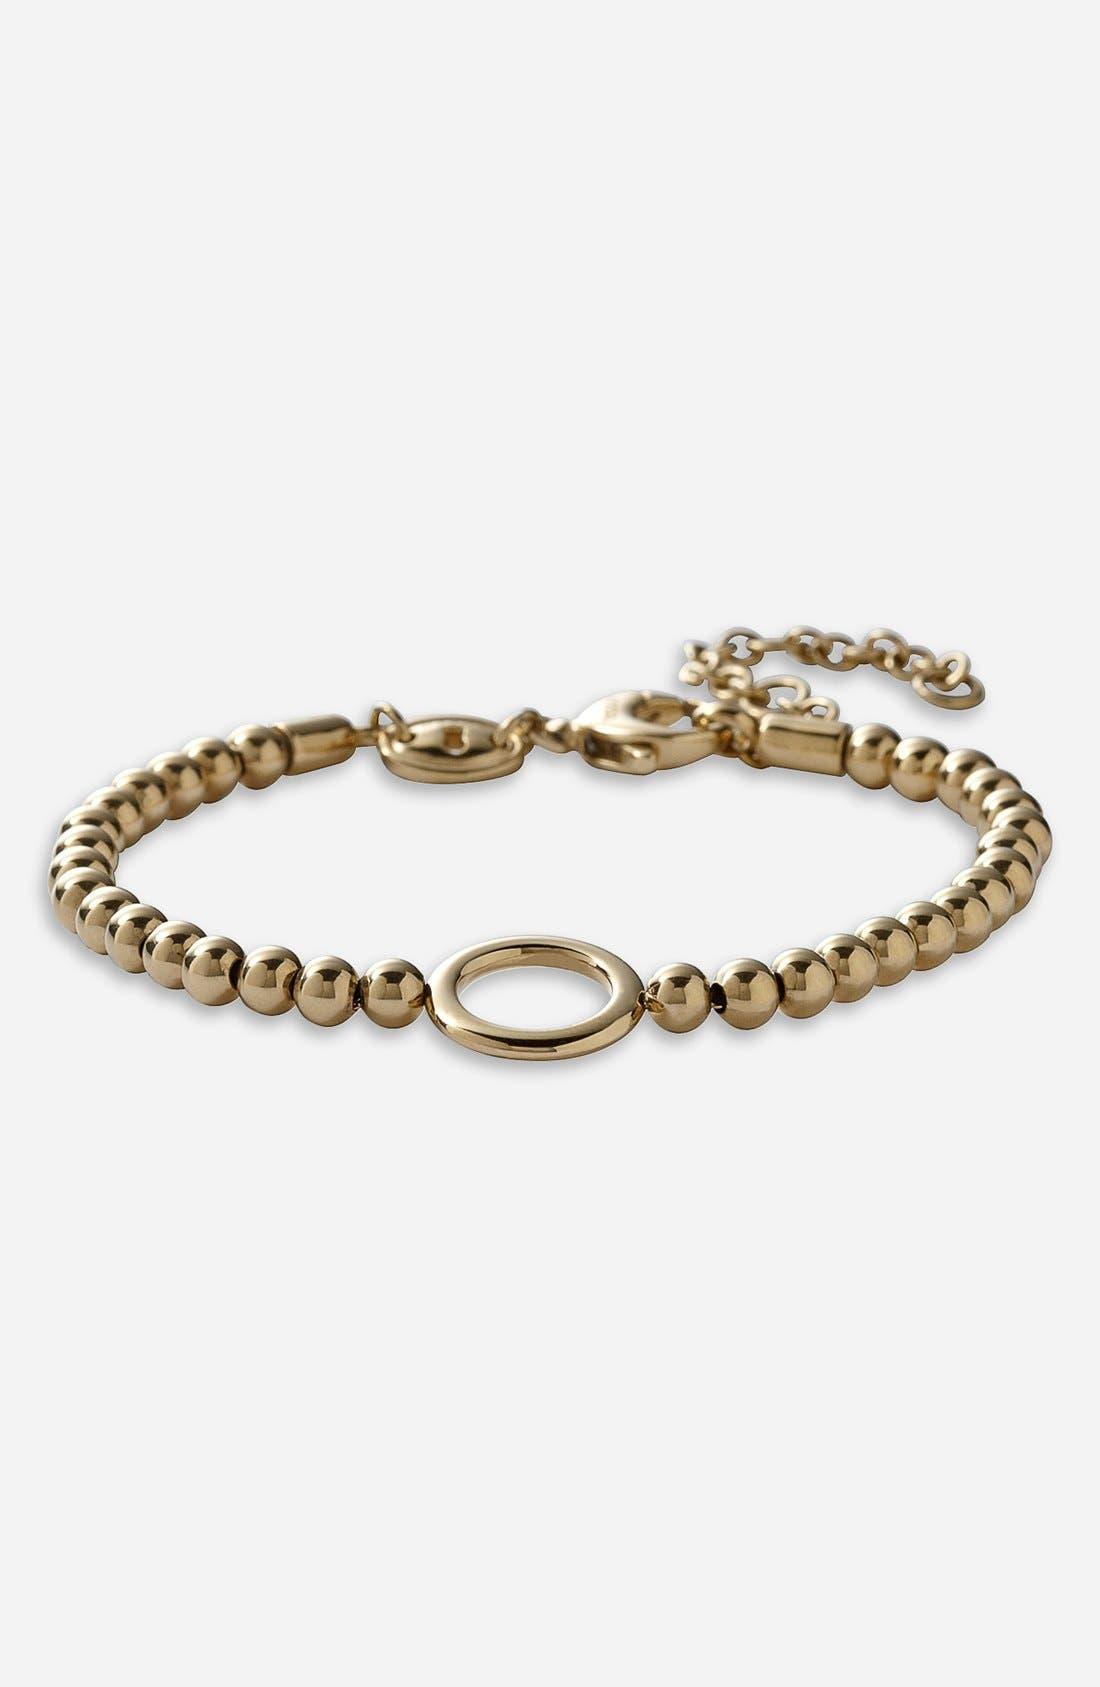 Alternate Image 1 Selected - Fossil Bead Charm Bracelet